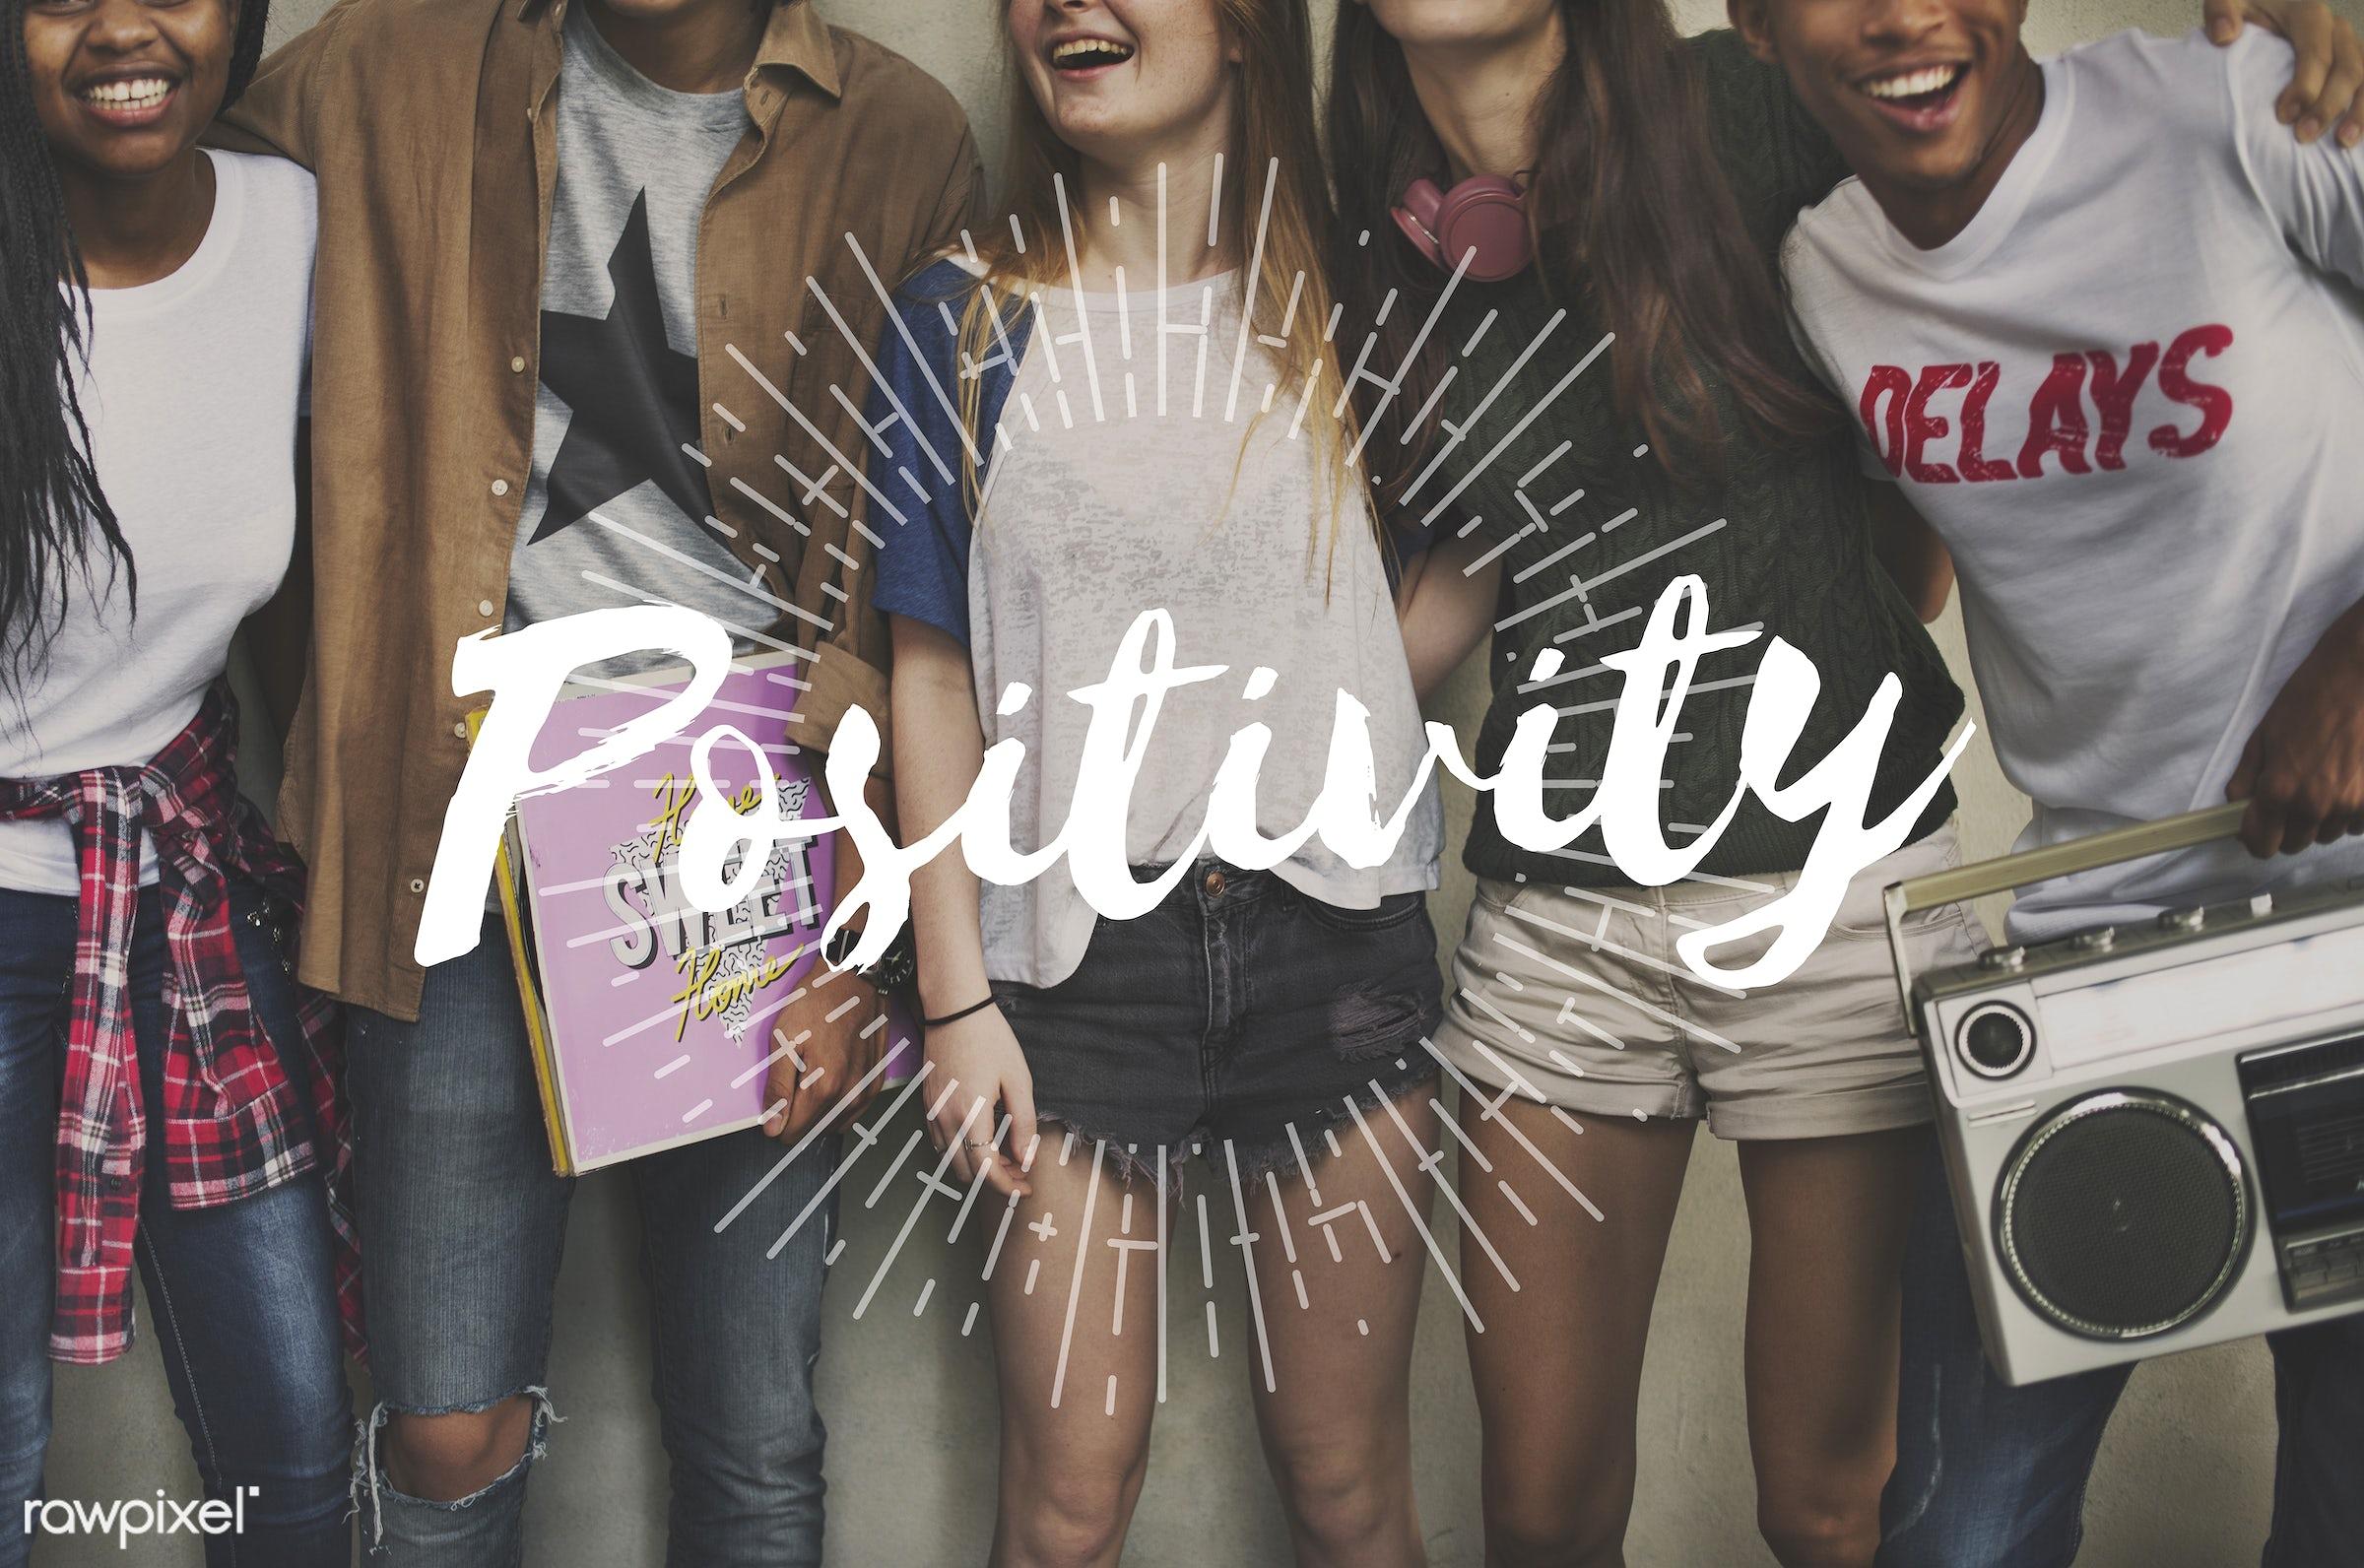 african descent, asian, audio, be positive, better, caucasian, day, delightful, diversity, enjoy, enjoyment, entertain,...